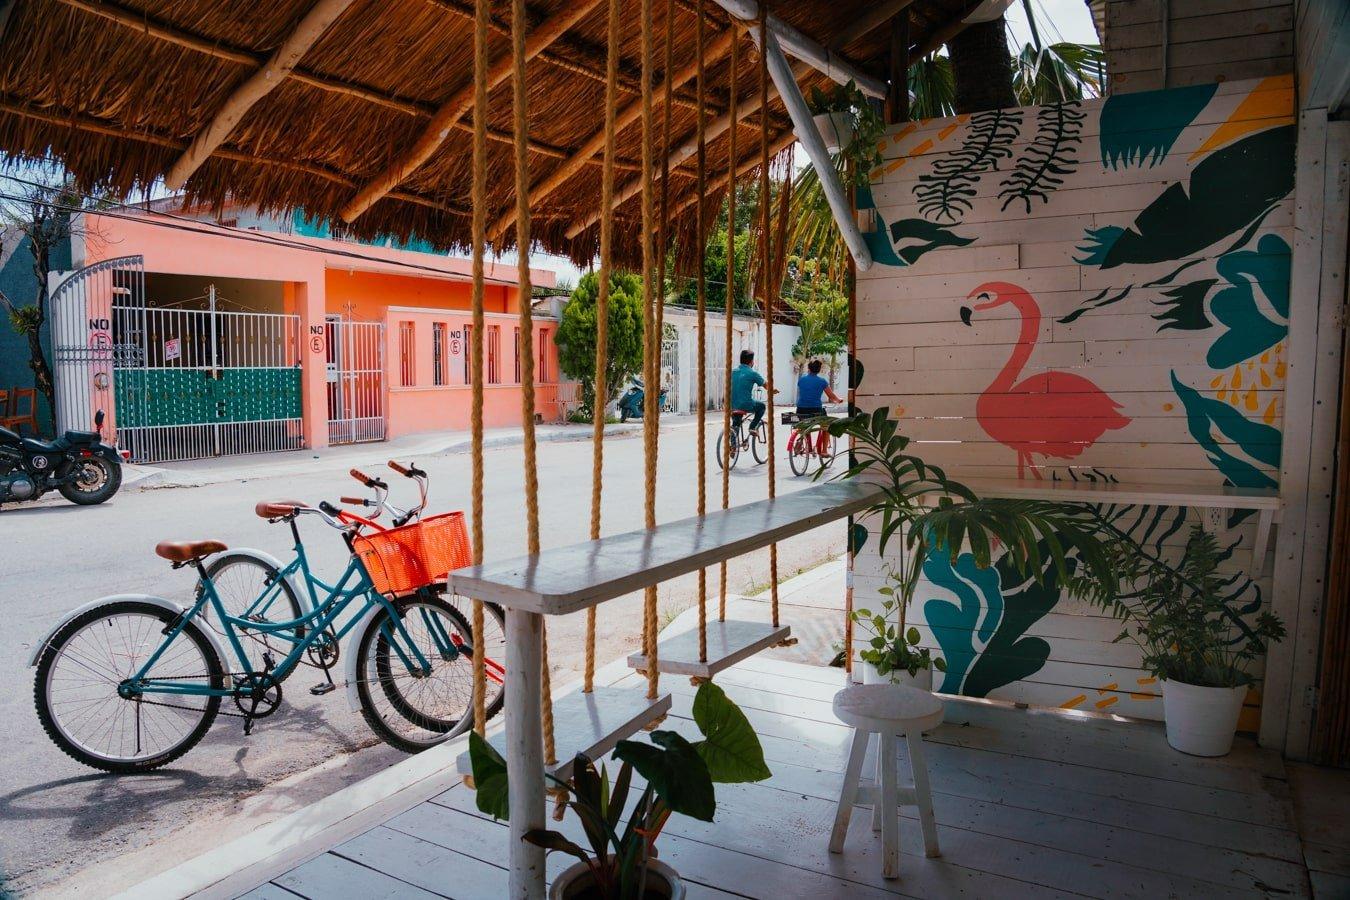 bike rentals in tulum parked in front of matcha mama hut in the pueblo